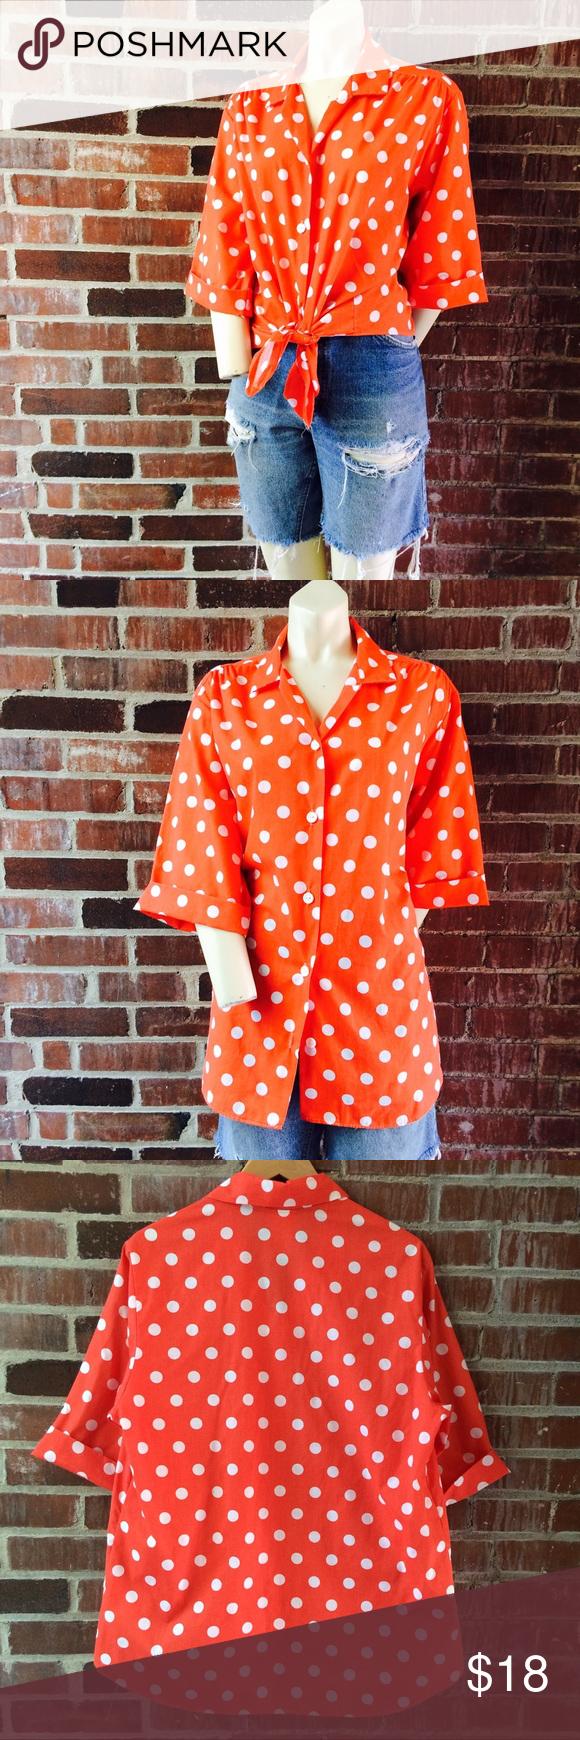 "Vintage Blair Mango Orange Polka Dot Shirt Vintage Blair mango orange Polka Dot top. Poly/cotton material. Size L. Bust 44"" Length 30"". Great vintage condition. Vintage Tops Button Down Shirts"